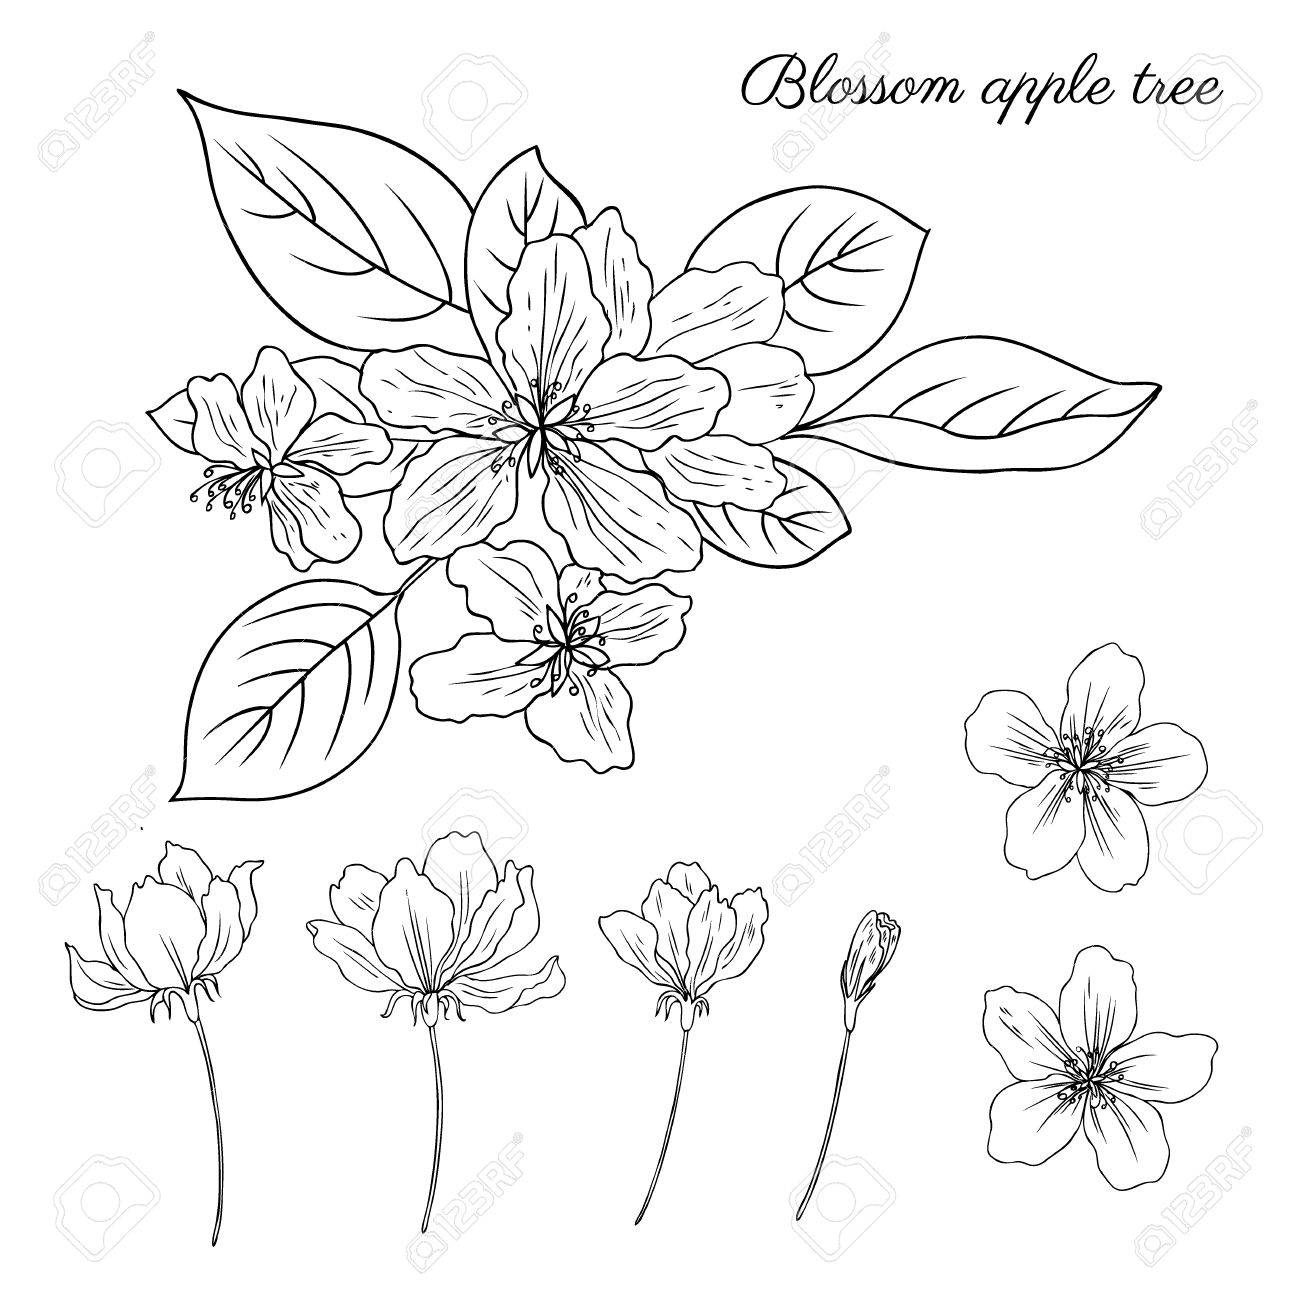 1300x1300 Apple Tree Blossom Flower, Bud, Leaves, Branch Vector Engraving